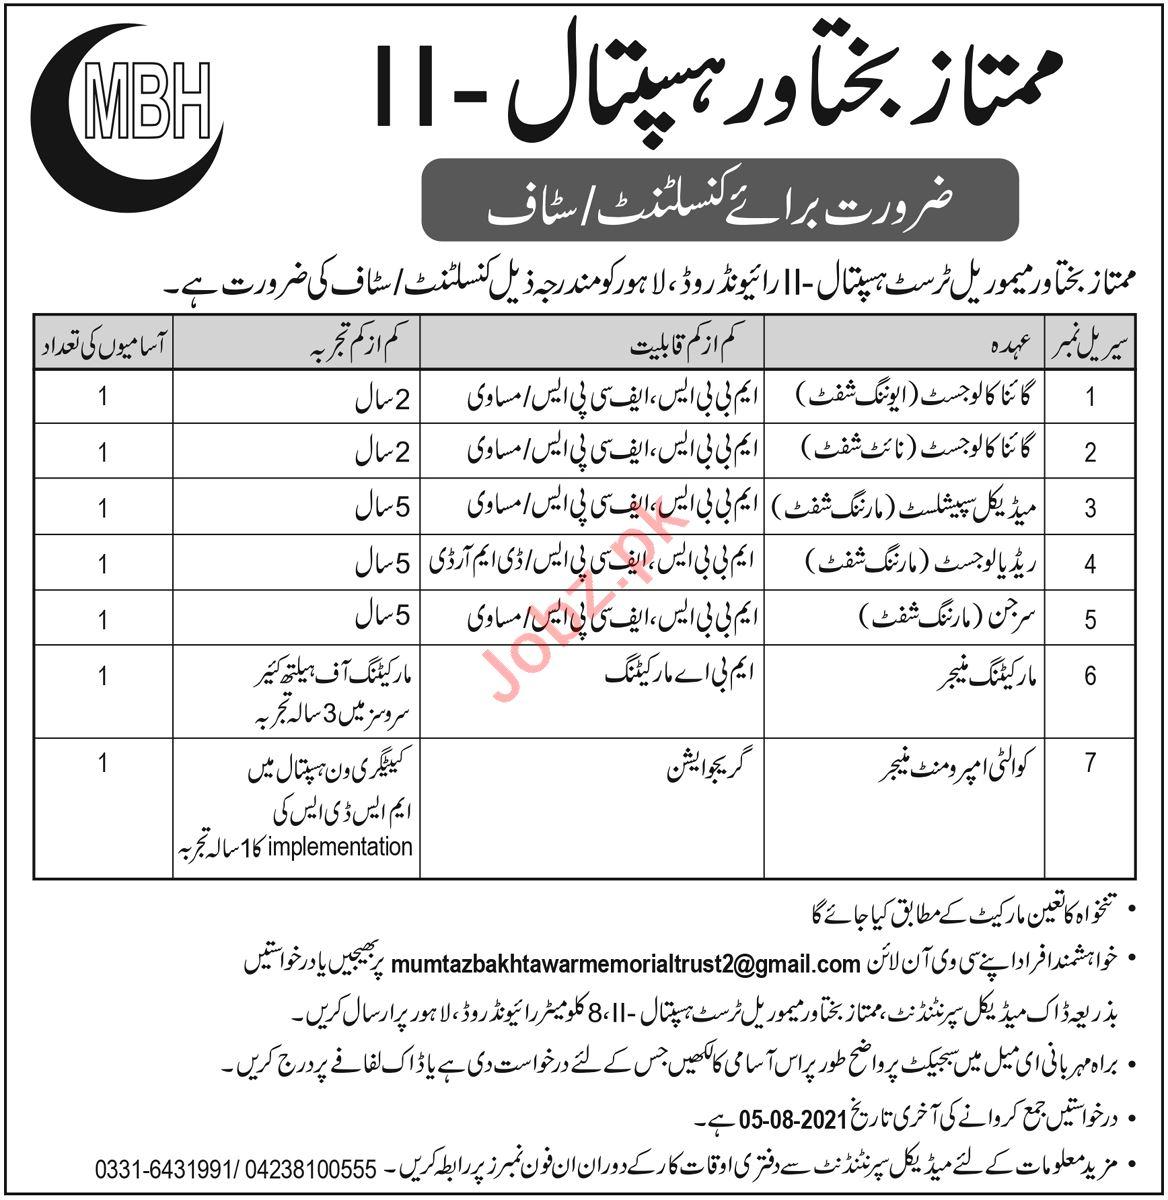 Mumtaz Bakhtawar Memorial Trust Hospital Lahore Jobs 2021